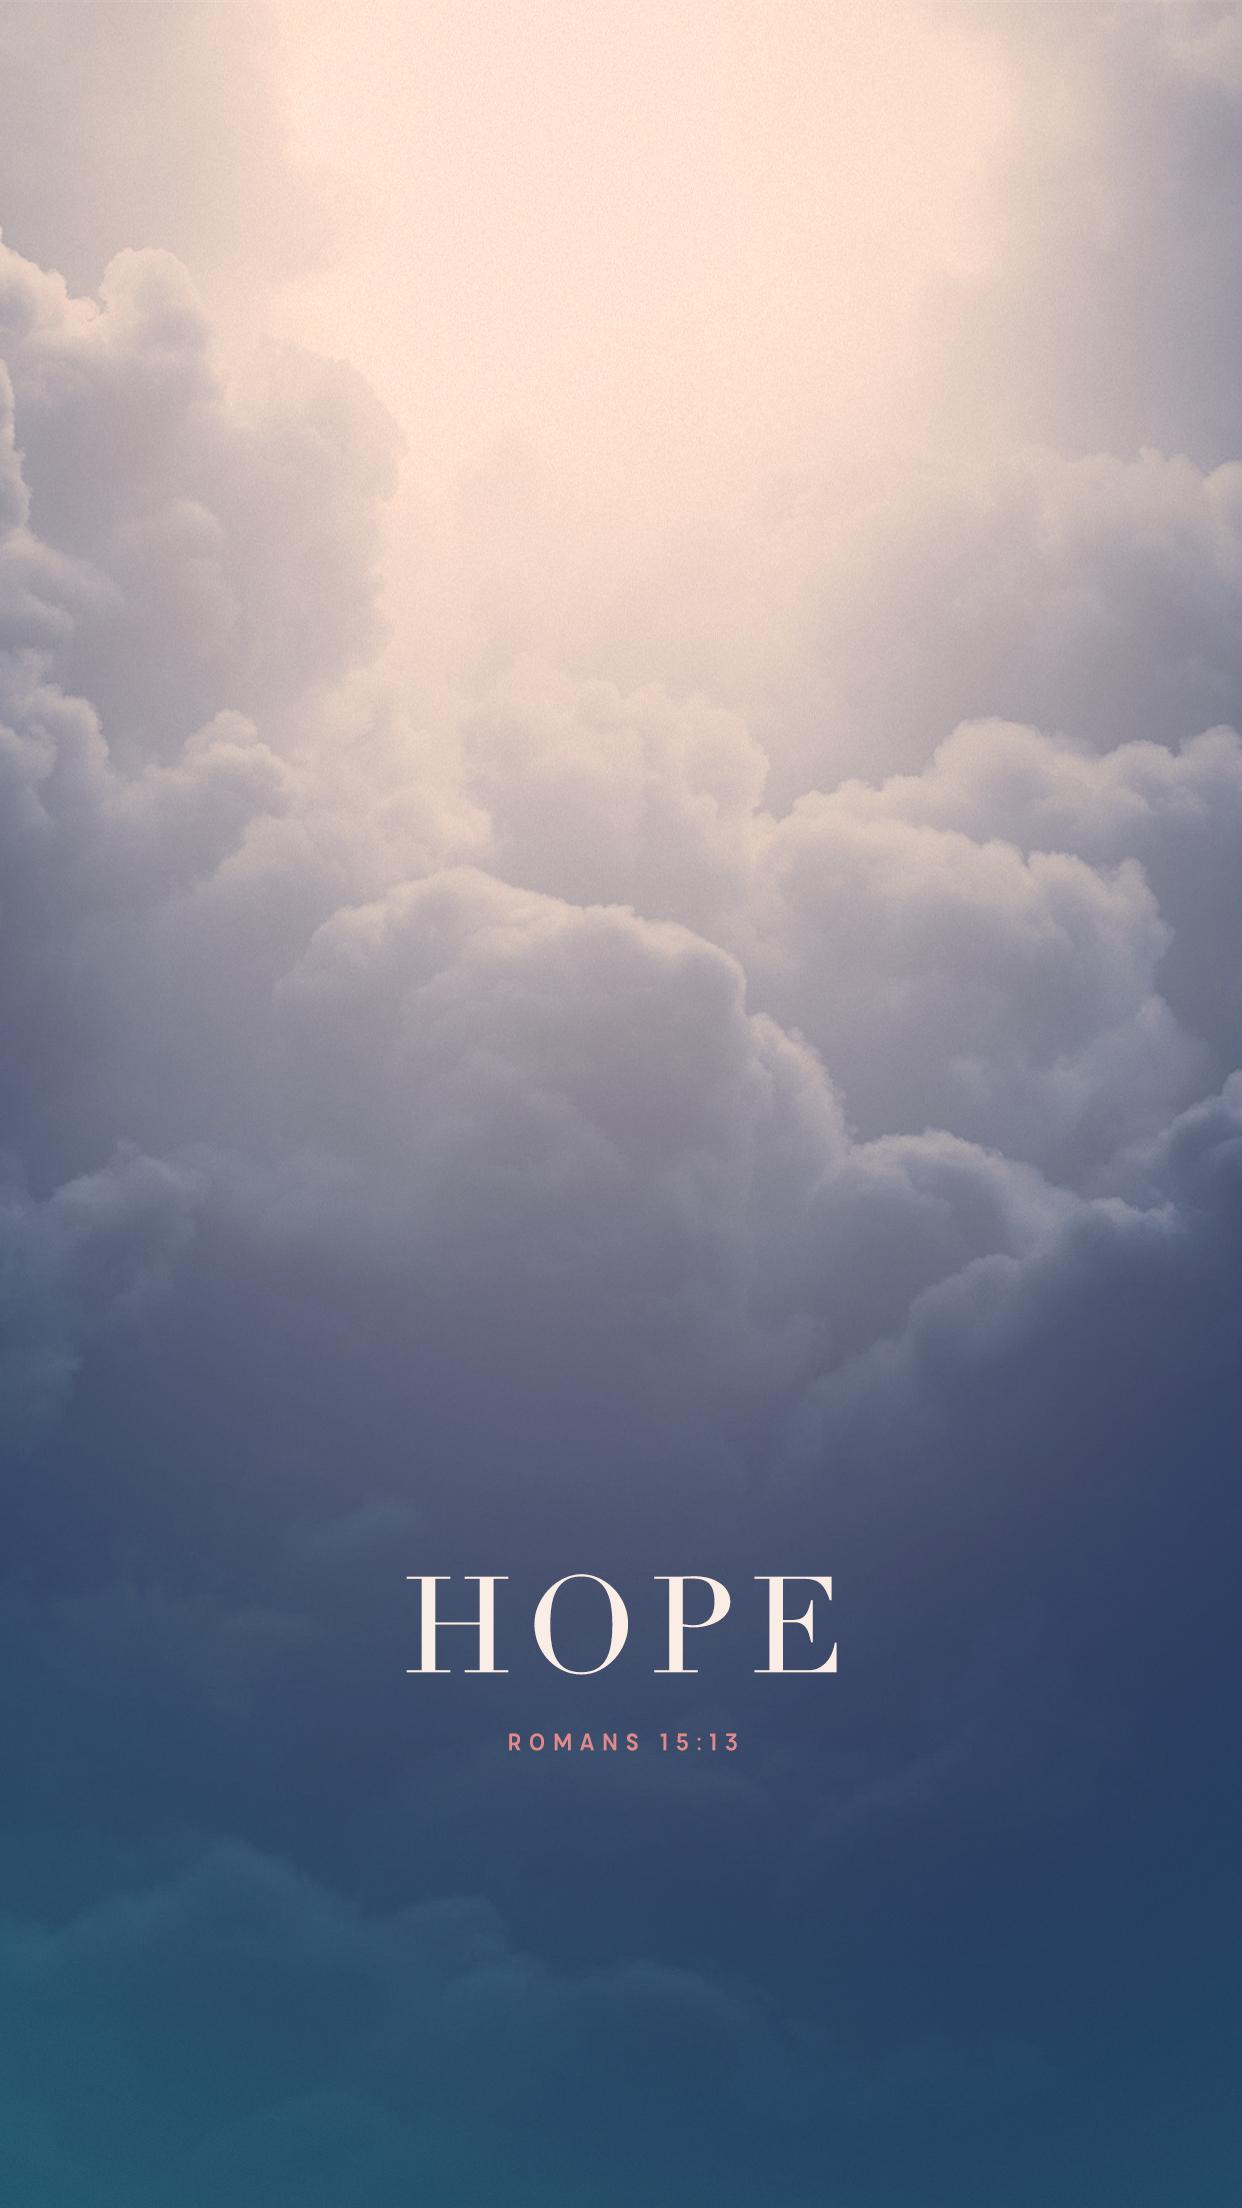 Hope Wallpaper   1242x2208   Download HD Wallpaper   WallpaperTip 1242x2208